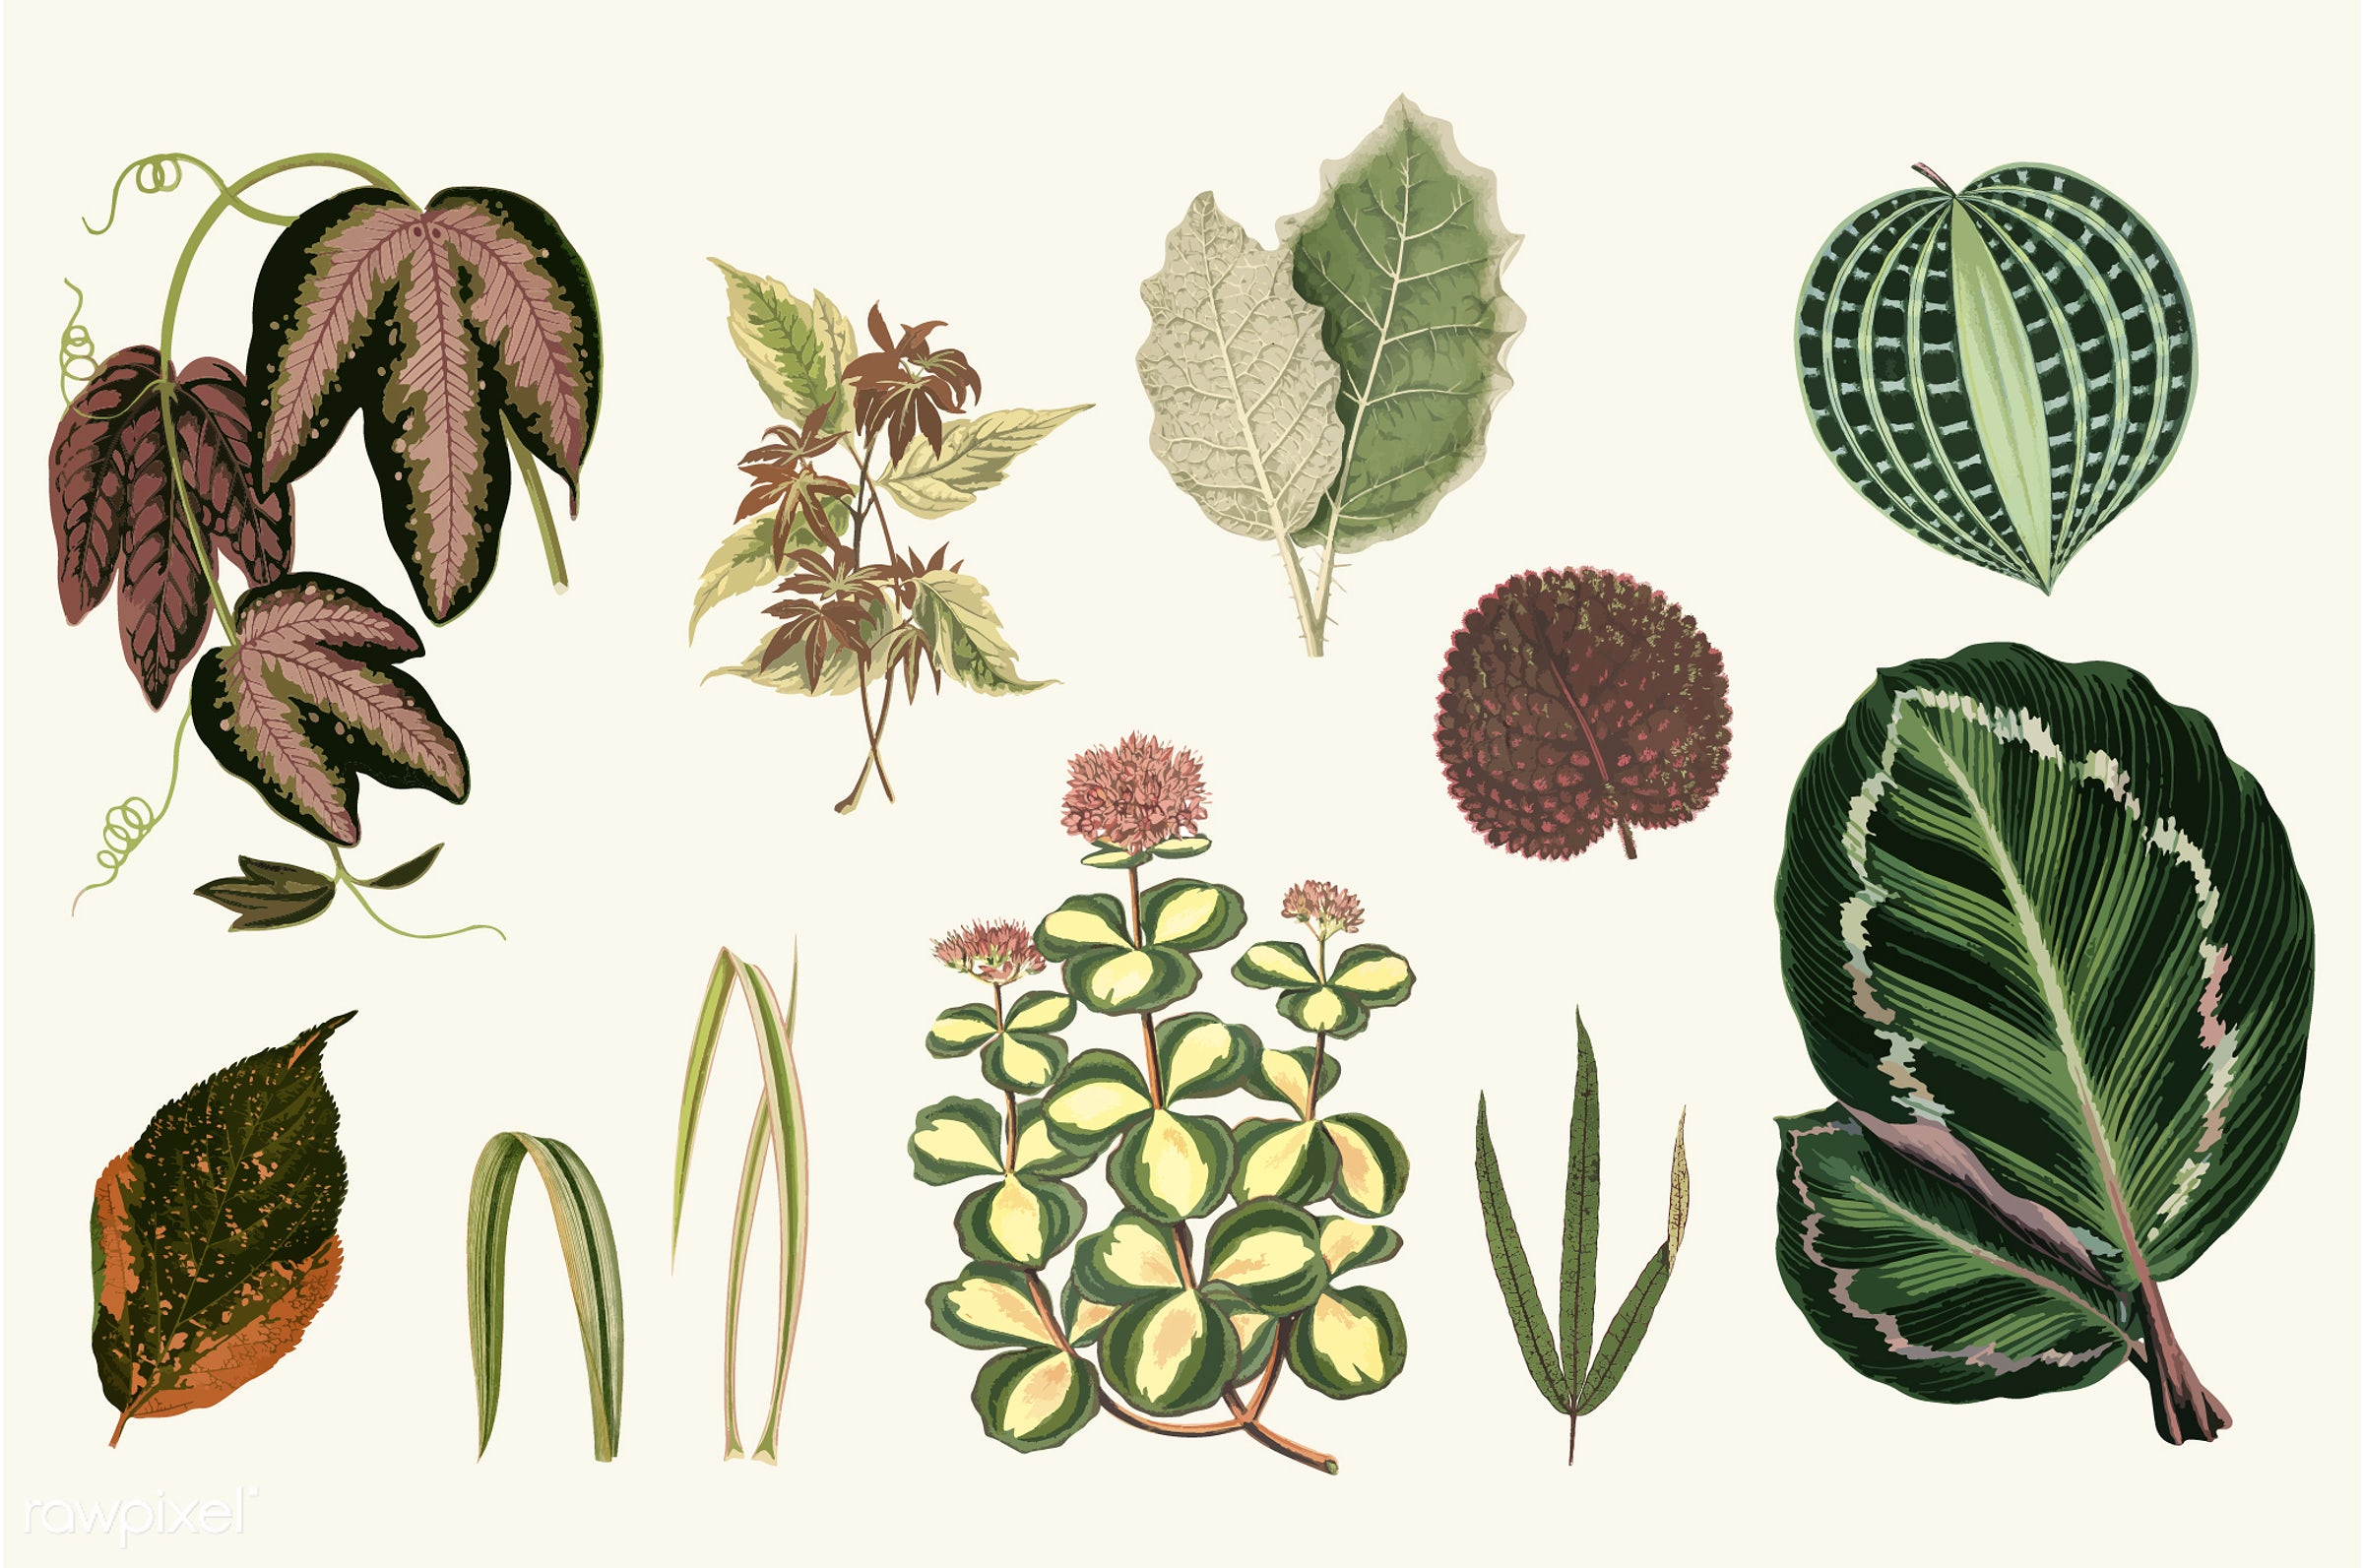 acalypha tricolor, aloifolia, collection, decorate, decoration, design, dichorisandra undata, drawing, exoniensis, genera...